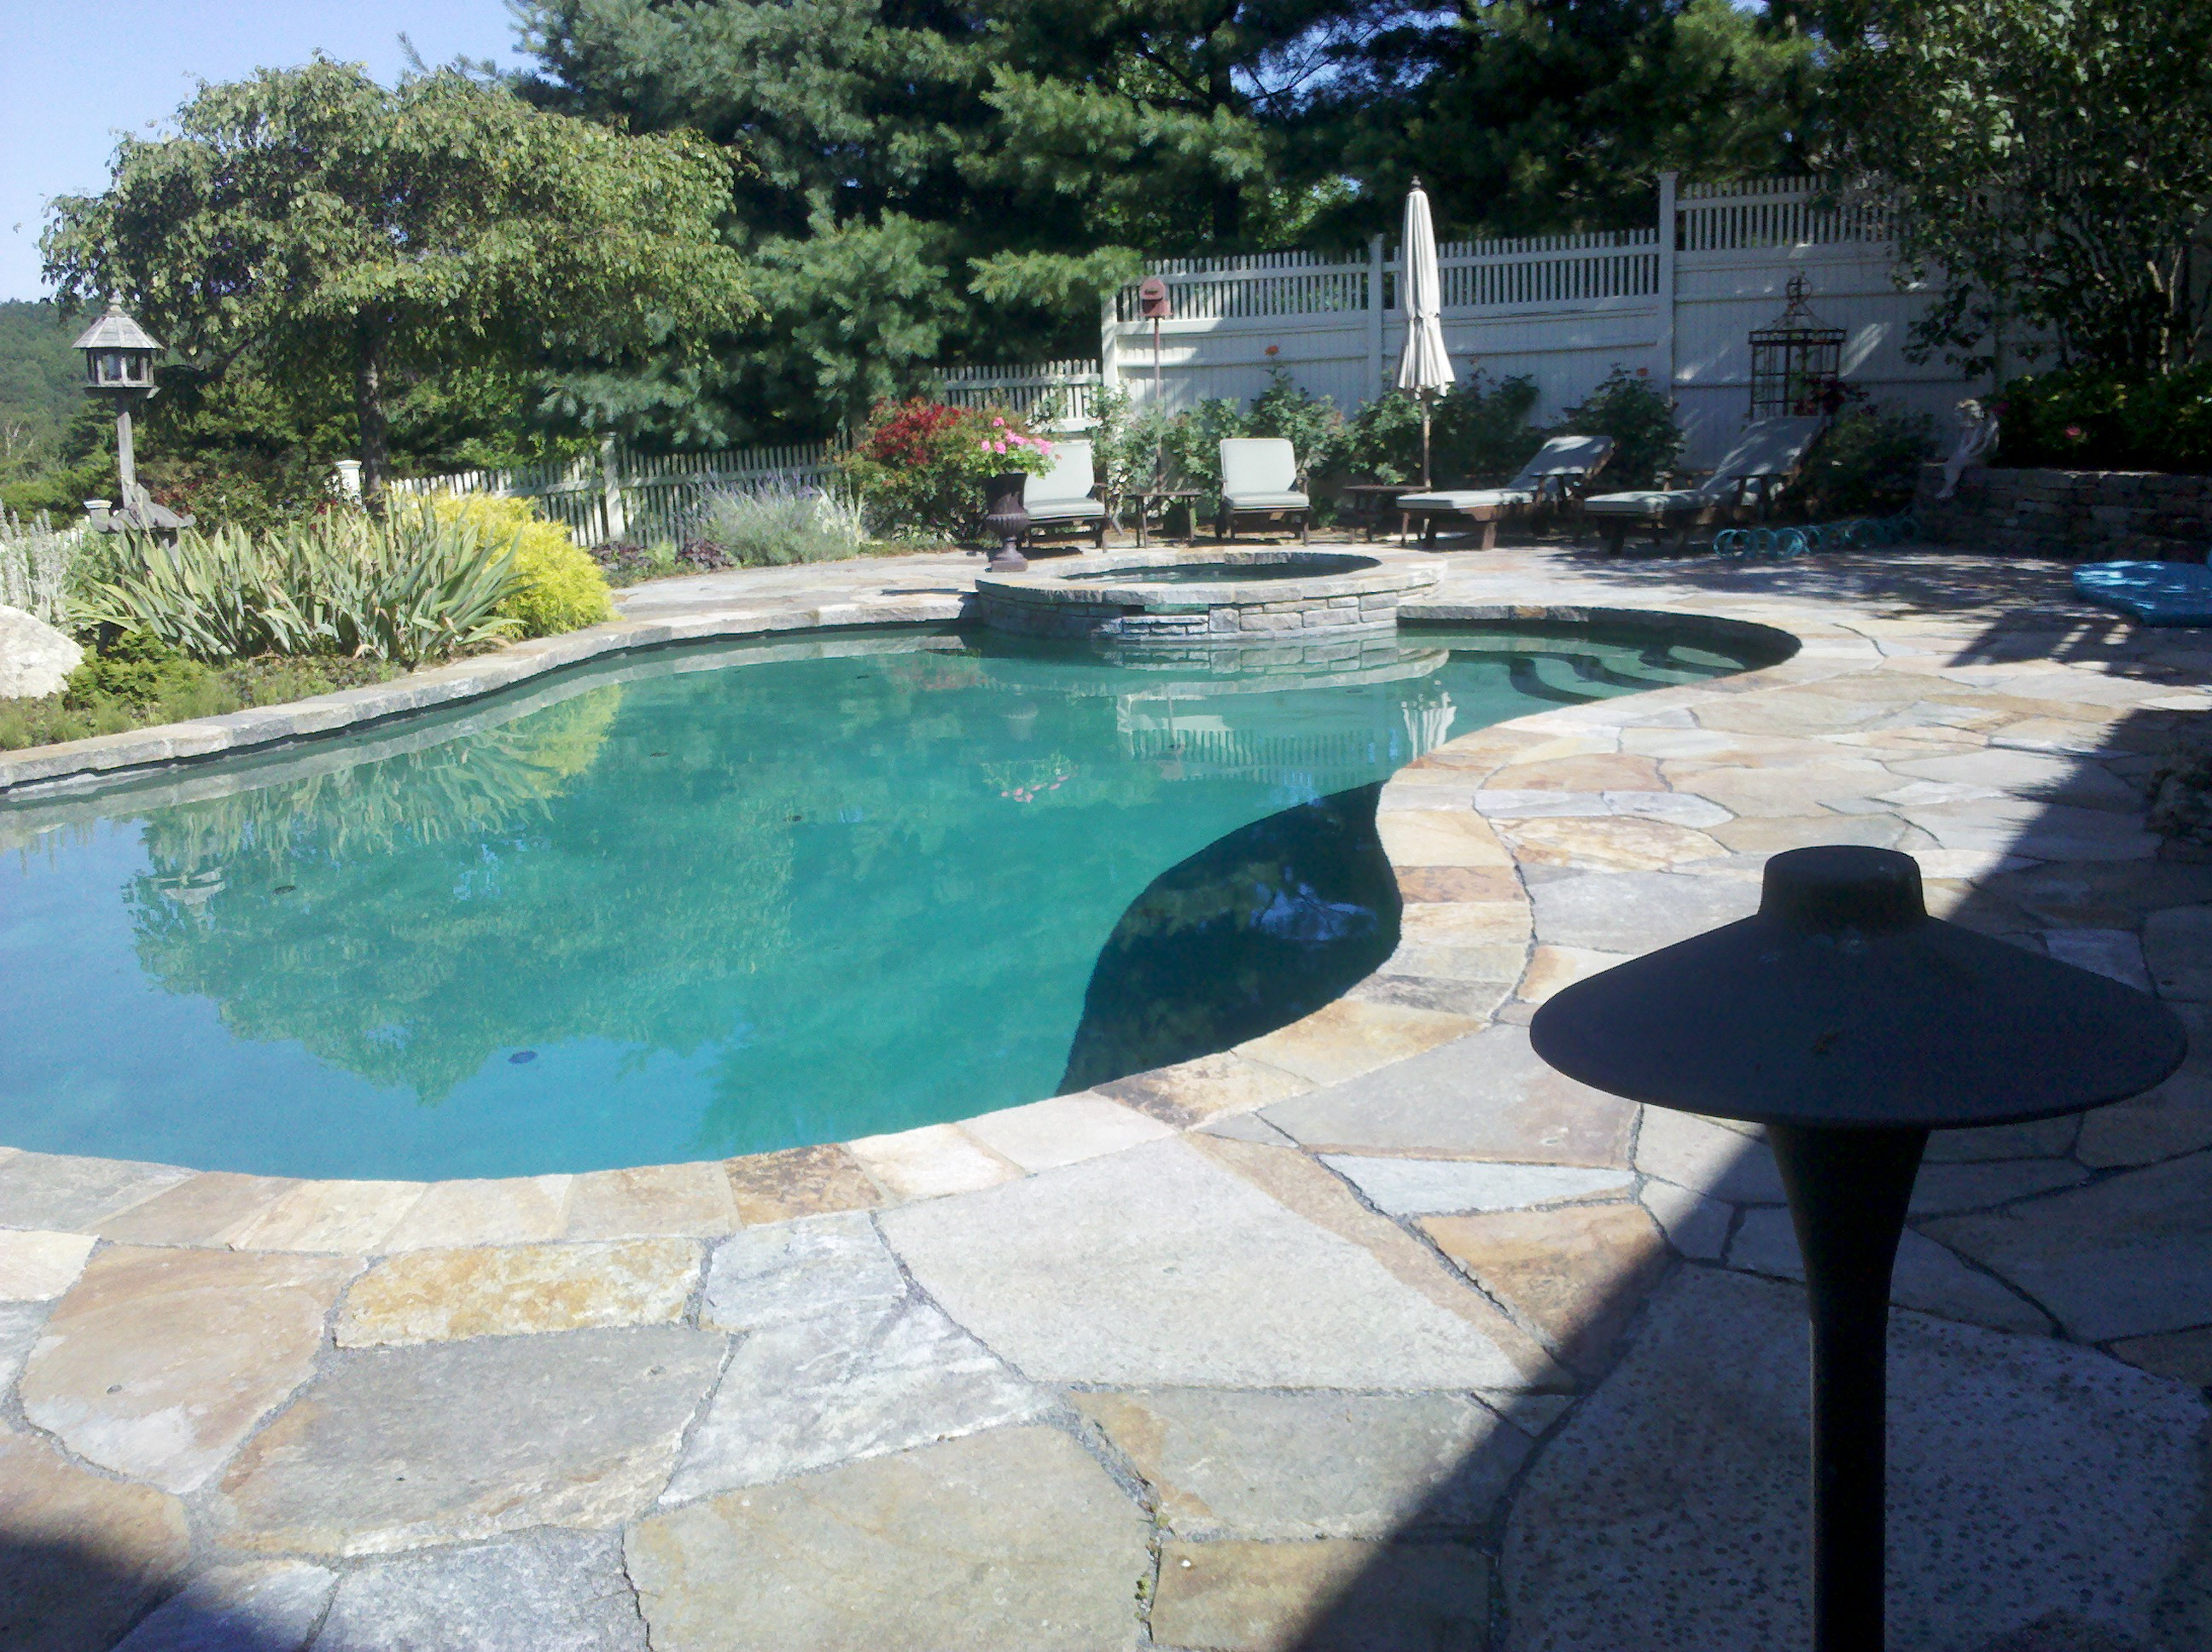 Stone masonry repair needed on this pool deck and patio Masonry